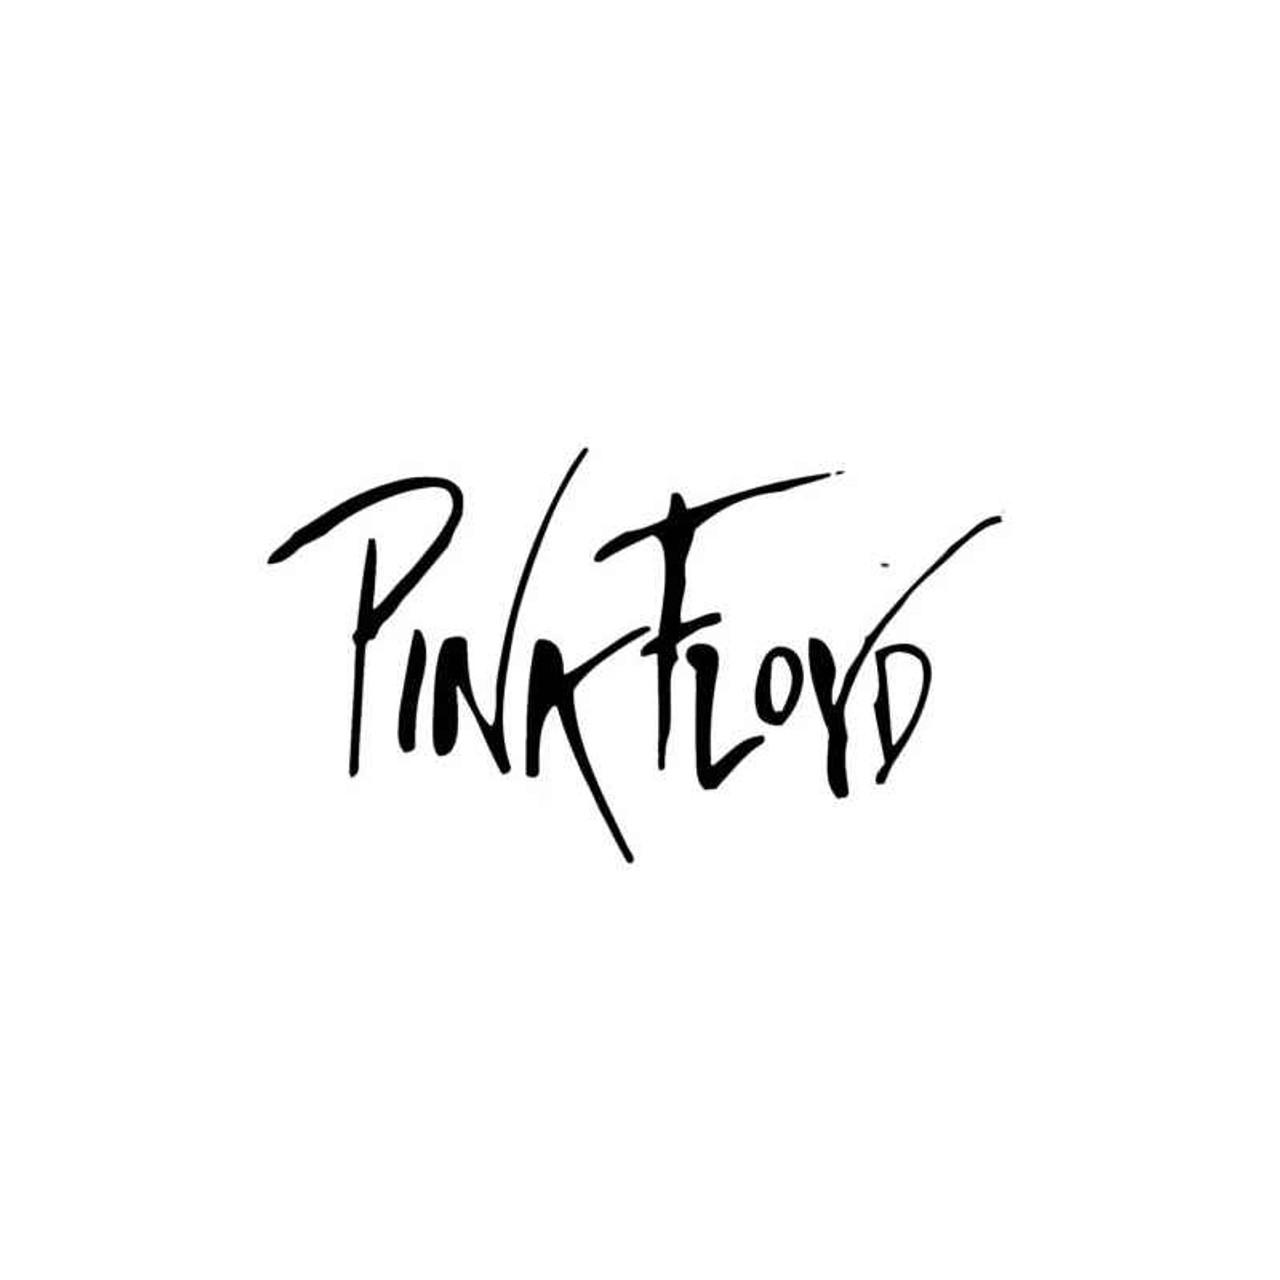 Music Rock Bands Pink Floyd v2 Decal Vinyl Truck Car Sticker